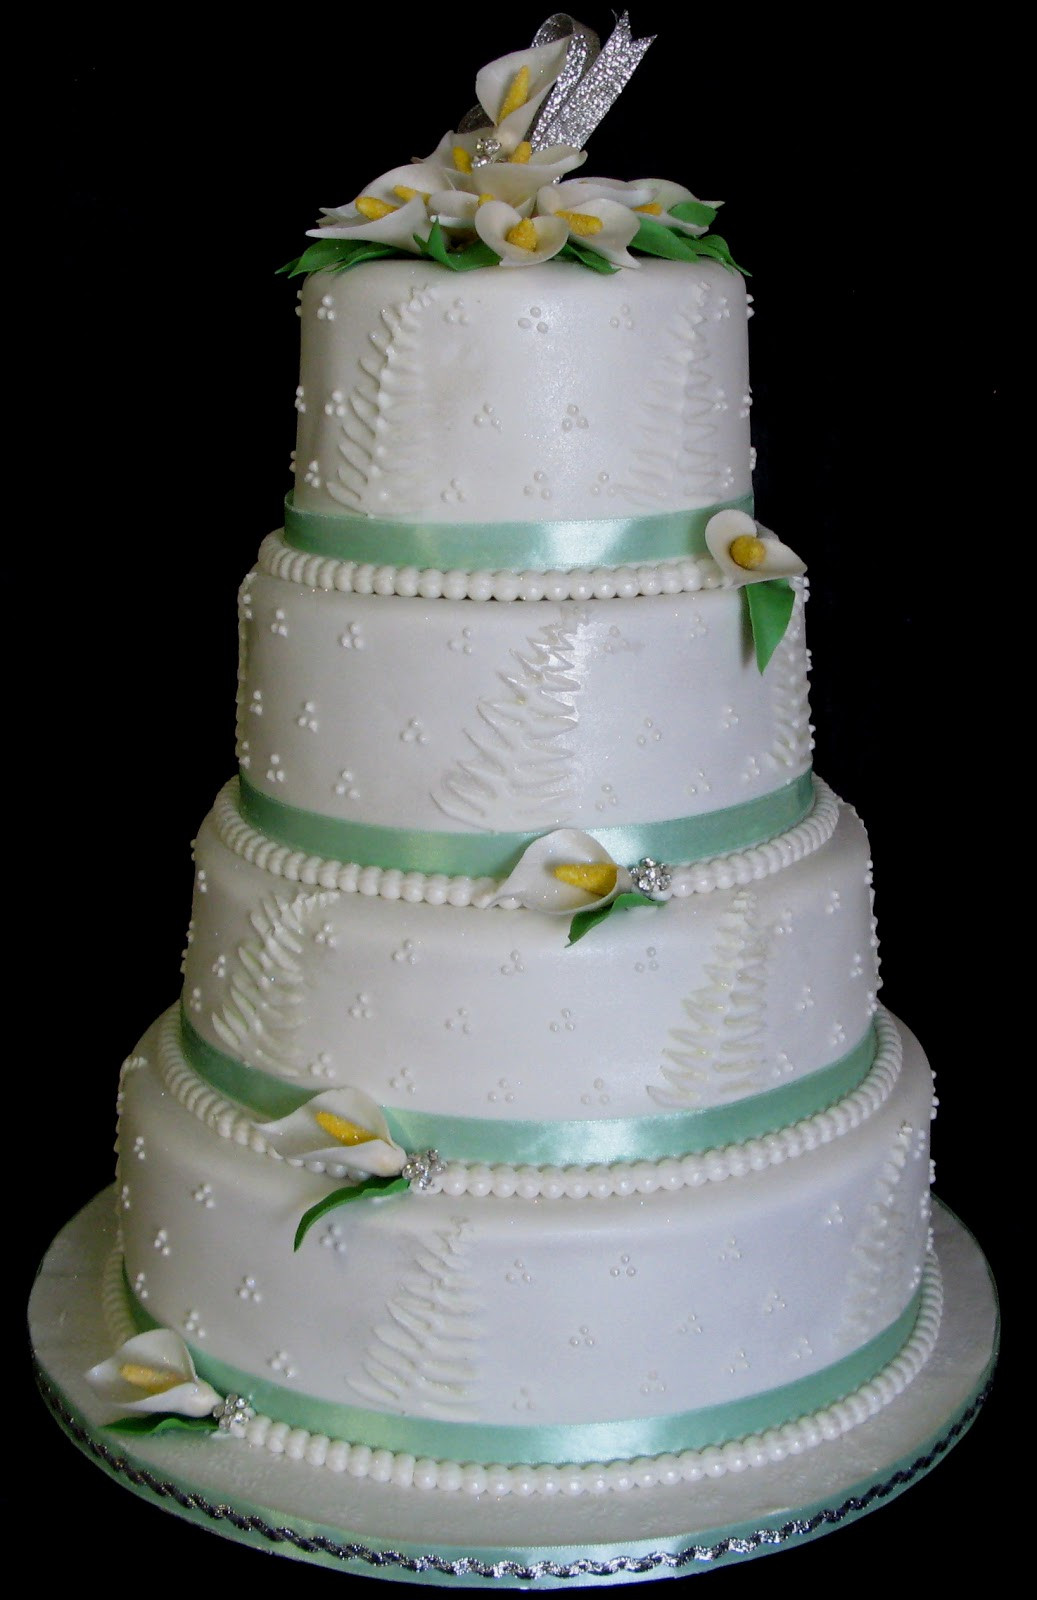 Wedding Cakes Tier  Sugarcraft by Soni Four Tier Wedding Cake Arum Lilies